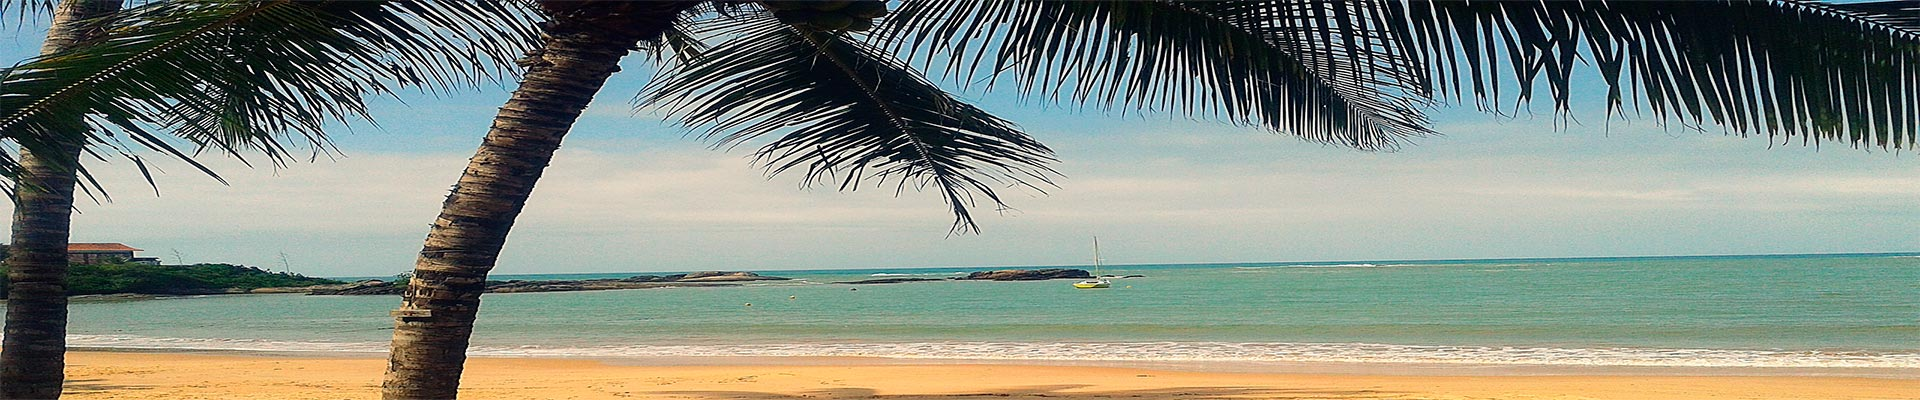 Praias Capixabas – 04 noites